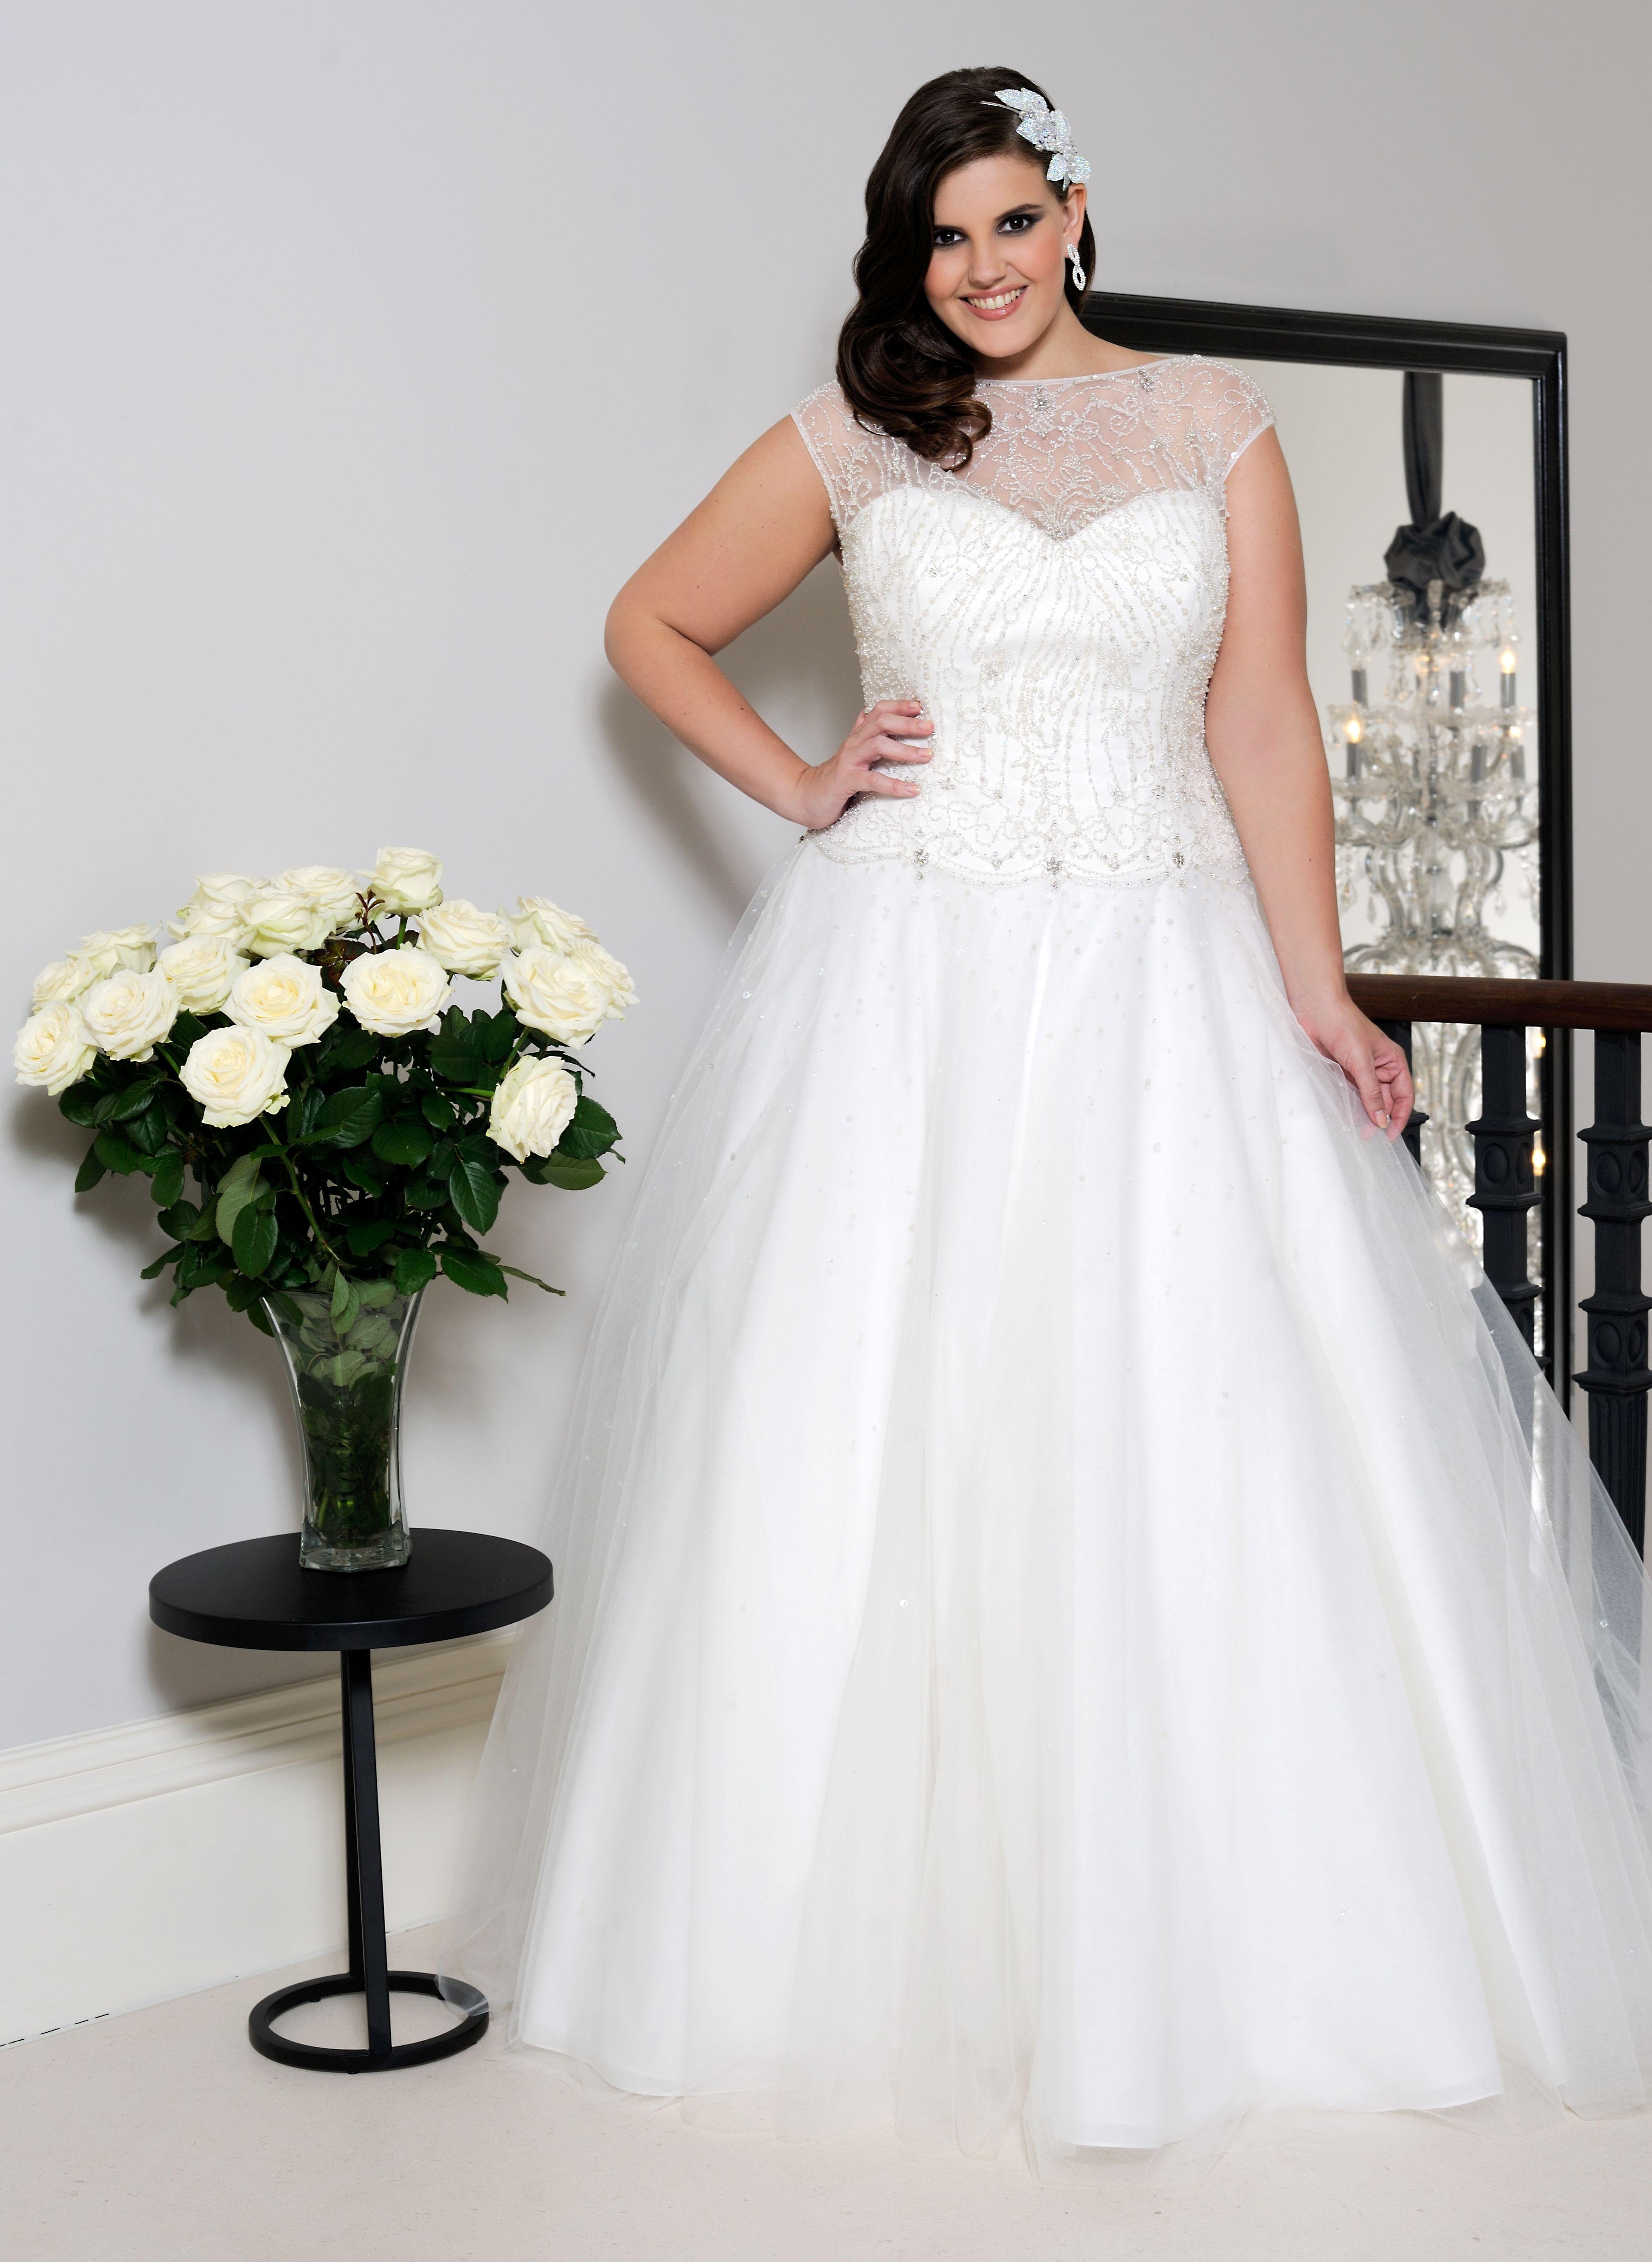 Wedding dresses for curvy brides  Pin by elisangela kalinka ambrosio ferreira on wedding dresses plus